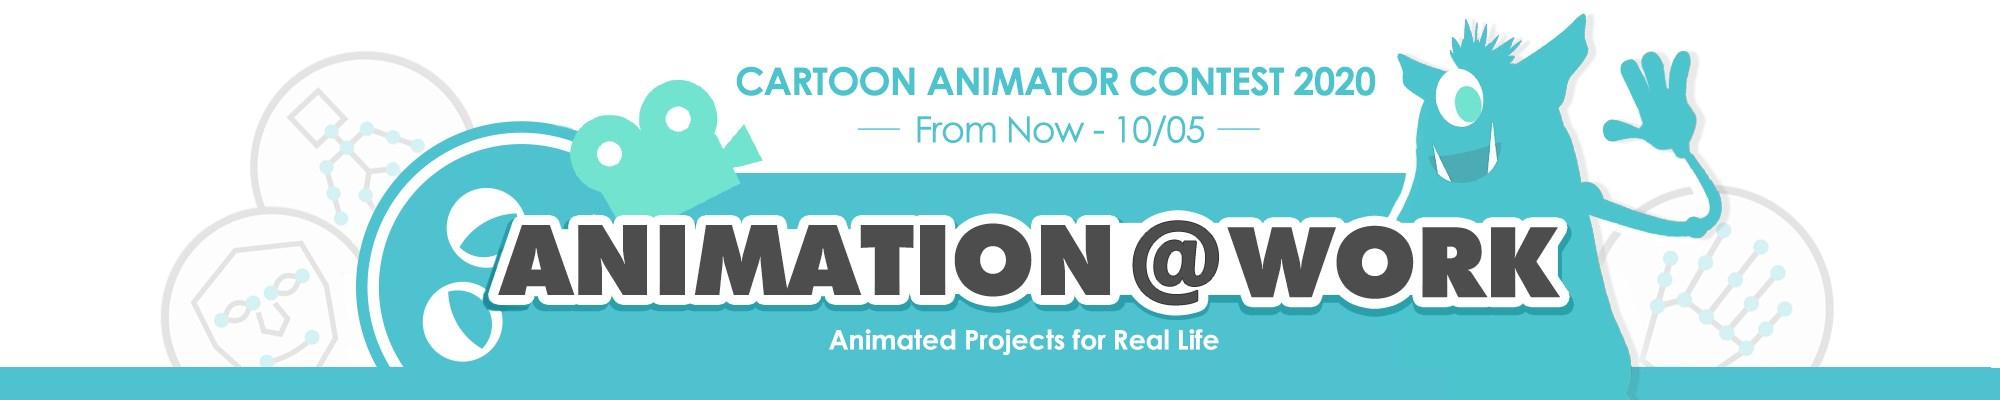 Cartoon Animator Contest 2020 - Animation@Work